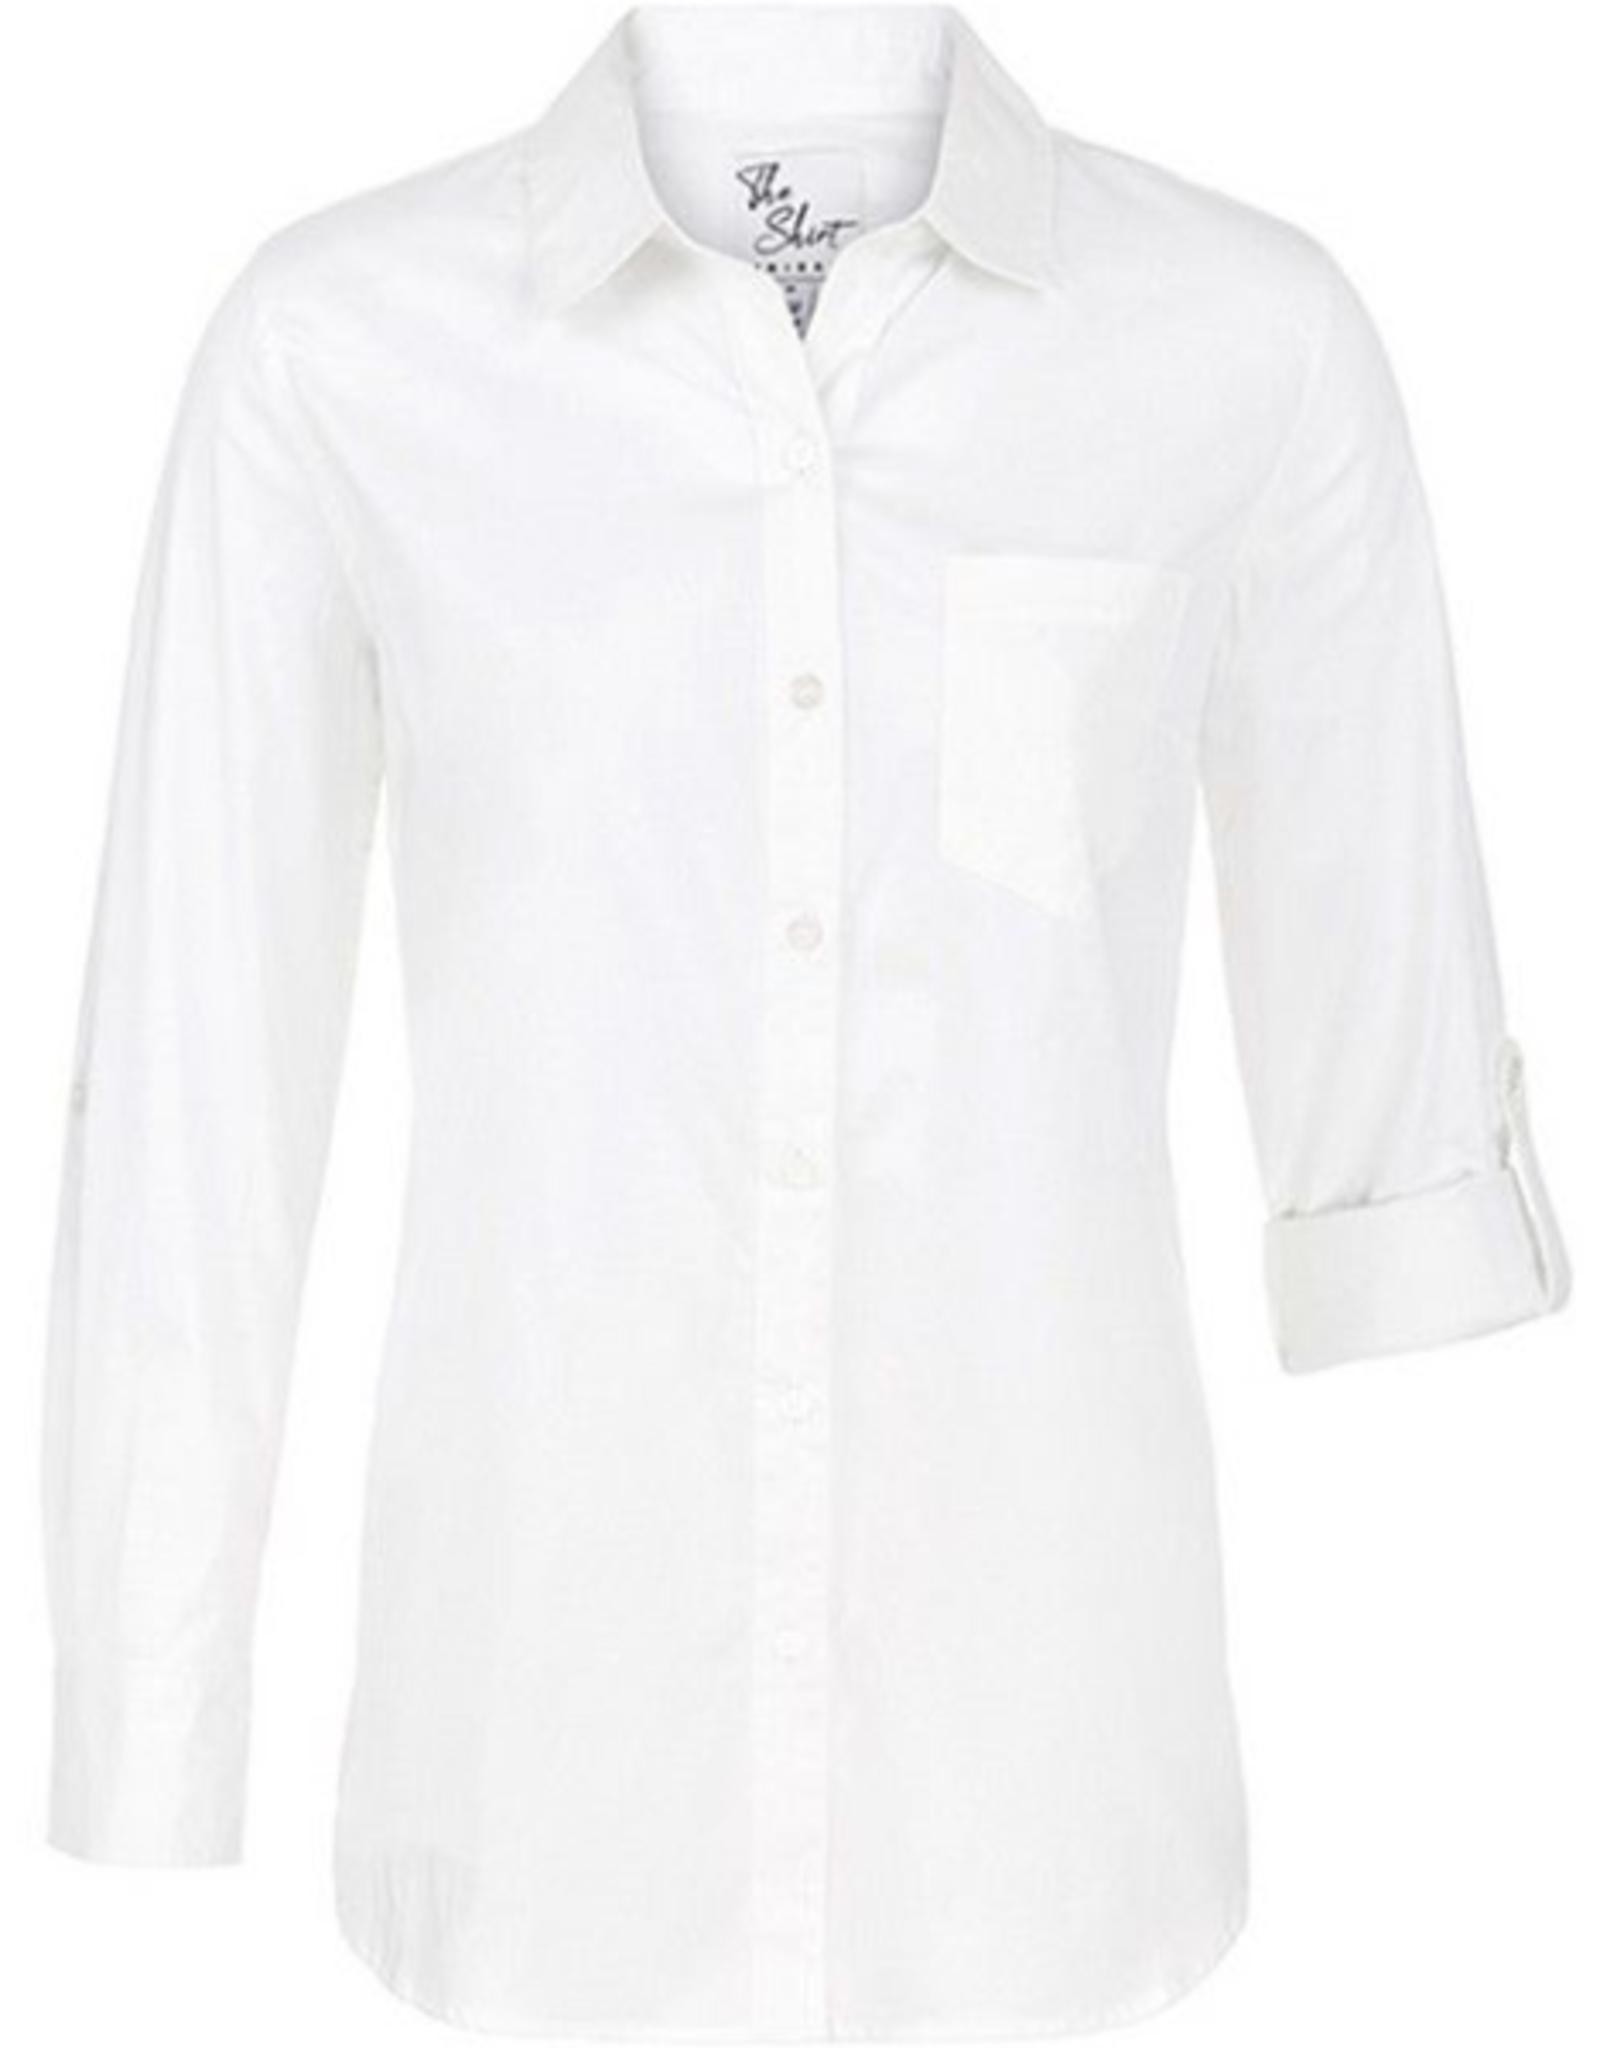 Roll Sleeve White Shirt